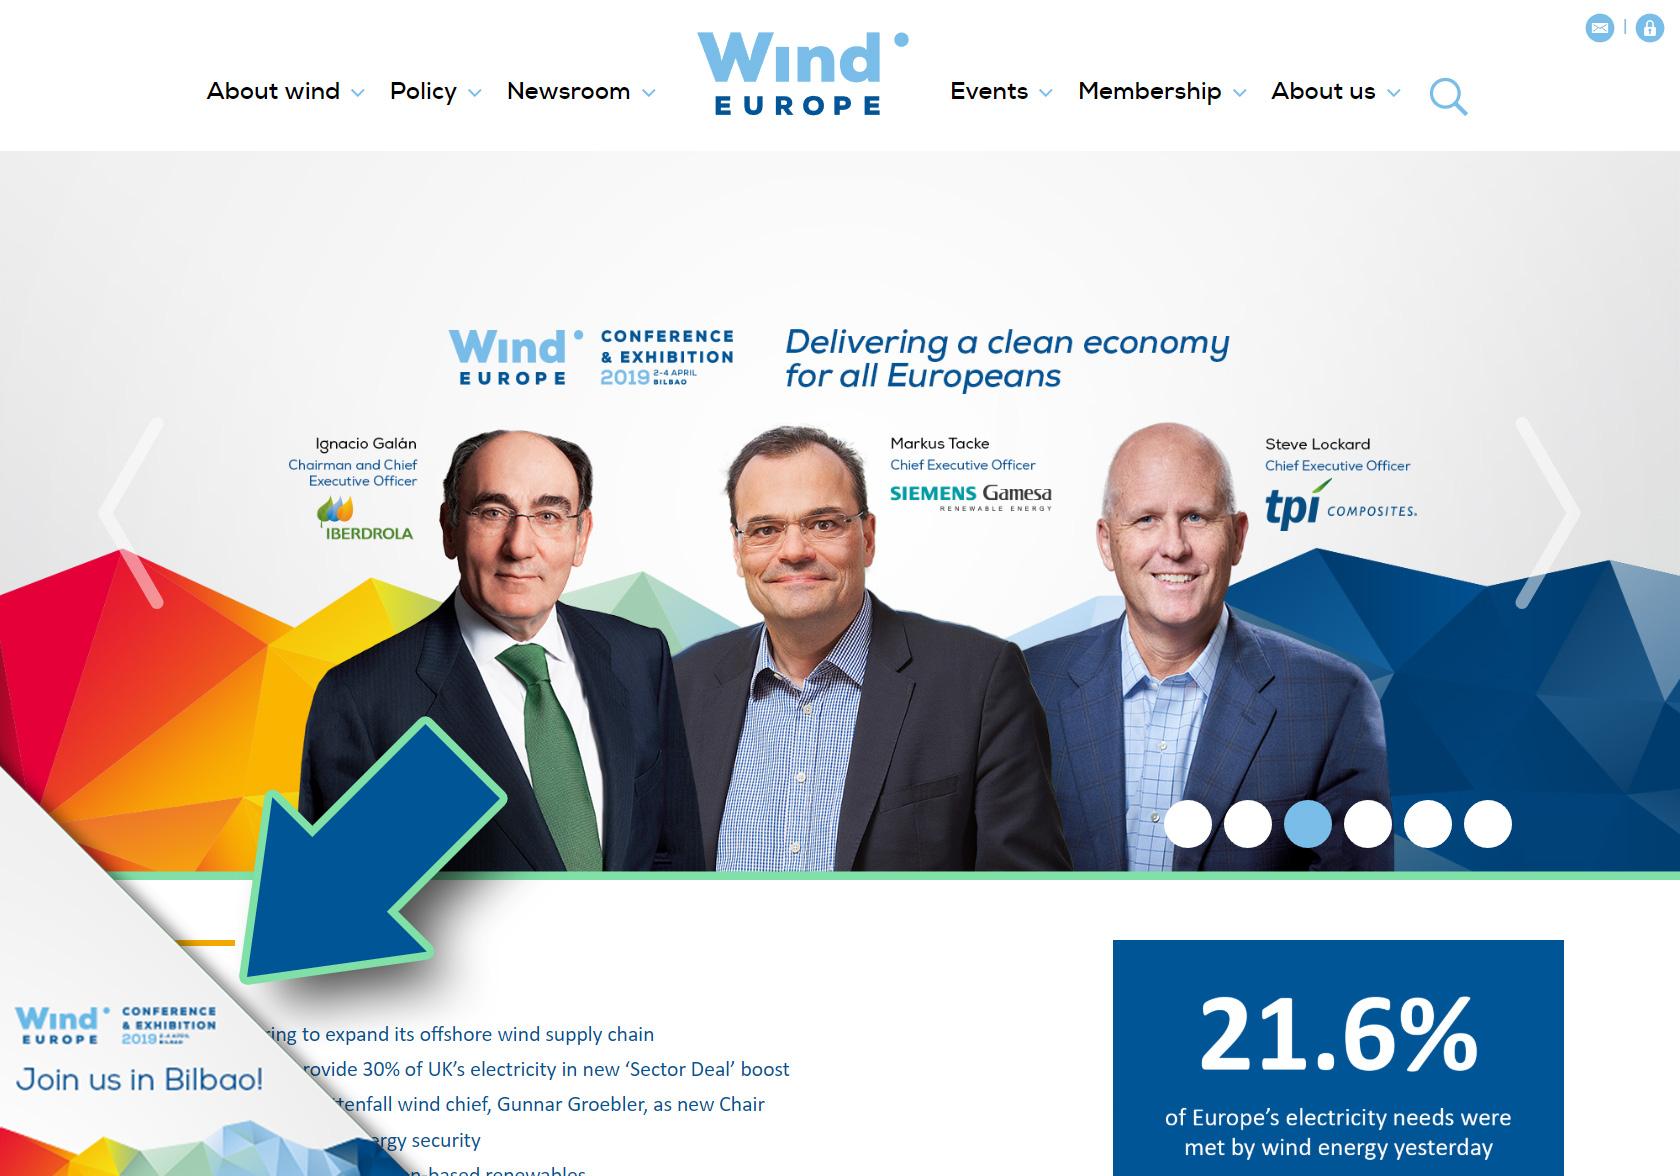 WindEurope 2019 Bilbao dogear